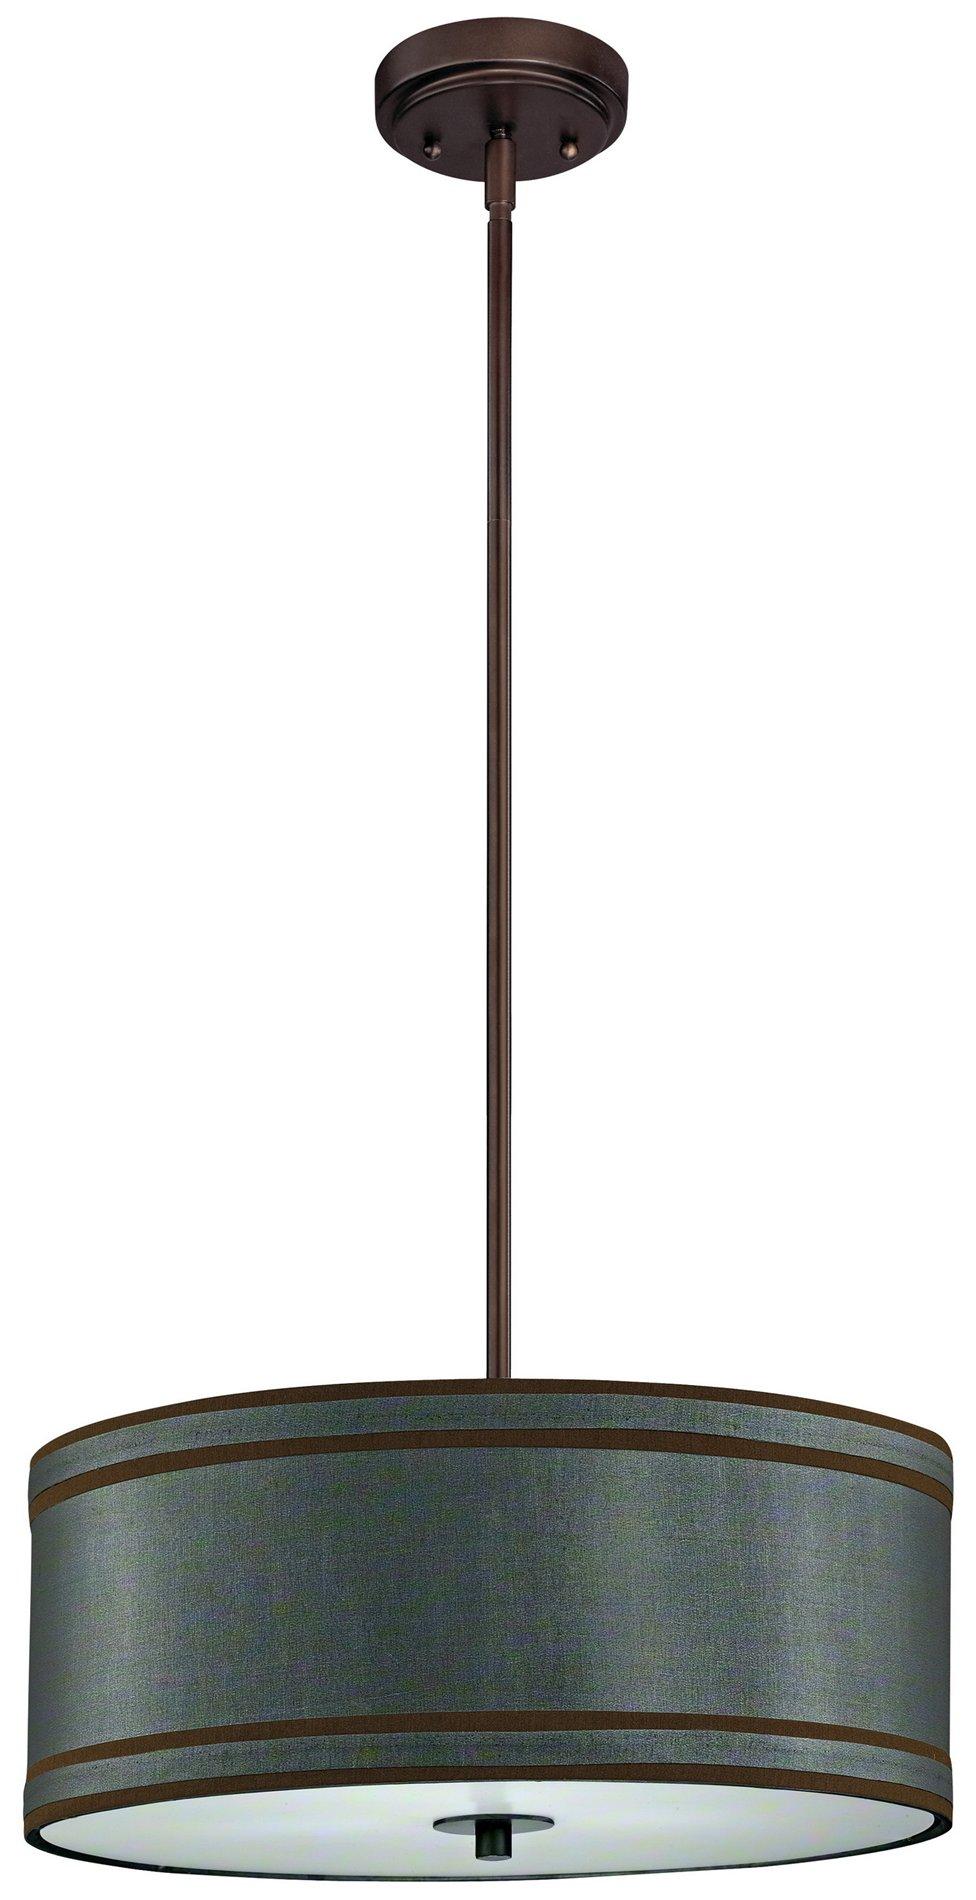 Clearance Lighting Fixtures Clearance Overstock Light Kingston Black Outdoor Wall Lantern